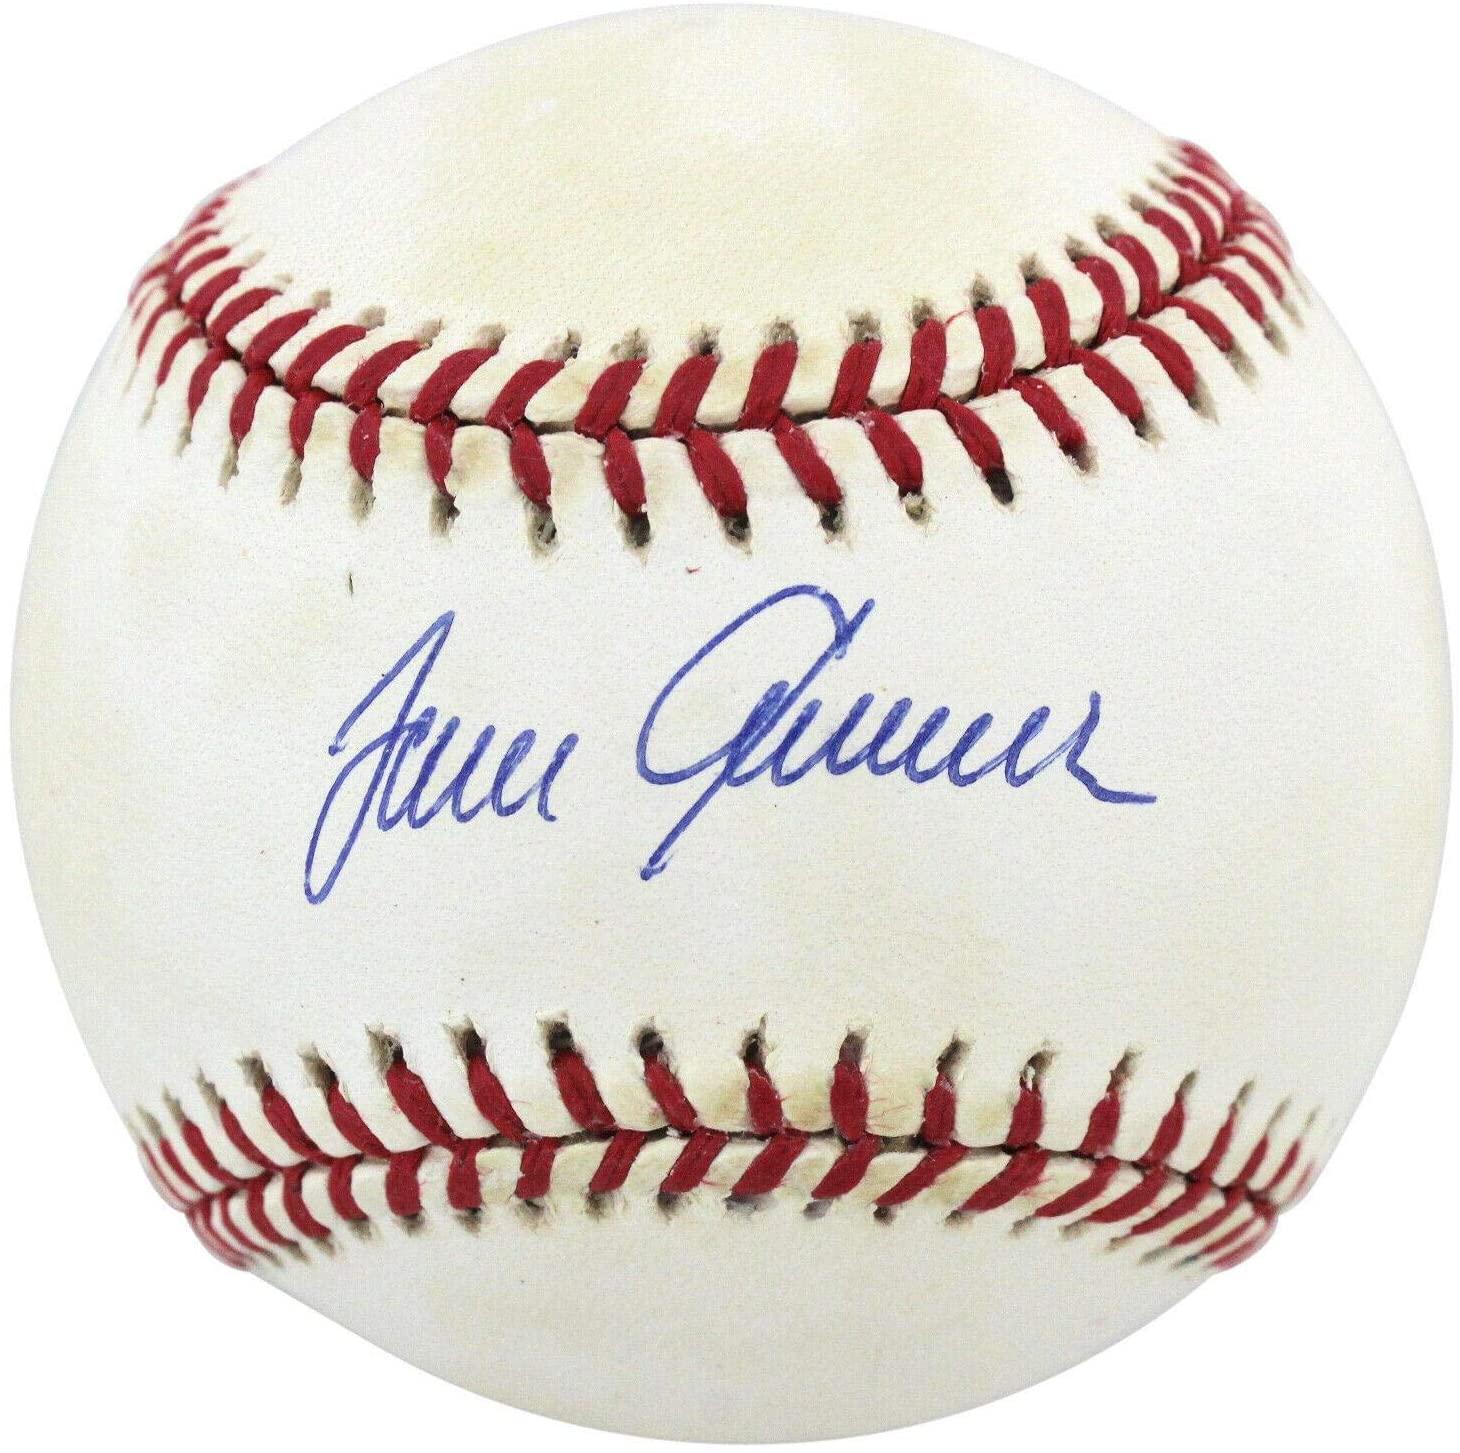 Tom Seaver Autographed Ball - Coleman Onl BAS #H87700 - Beckett Authentication - Autographed Baseballs